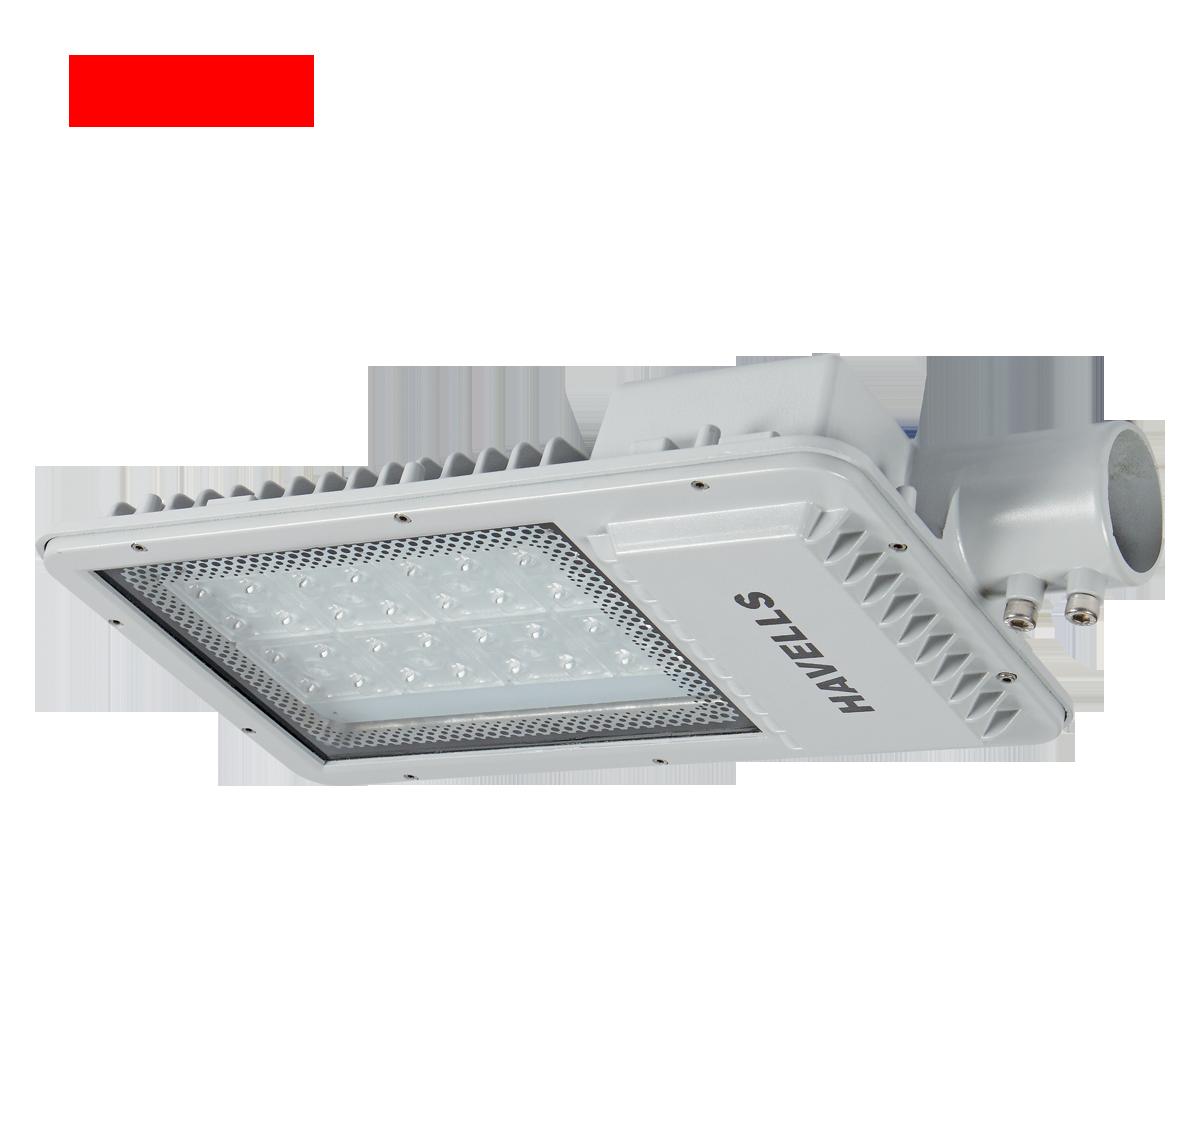 Street Lightings Light Luminaires Havells India Led Lamp Wiring Kits Endura Cityliner Neo 120 W